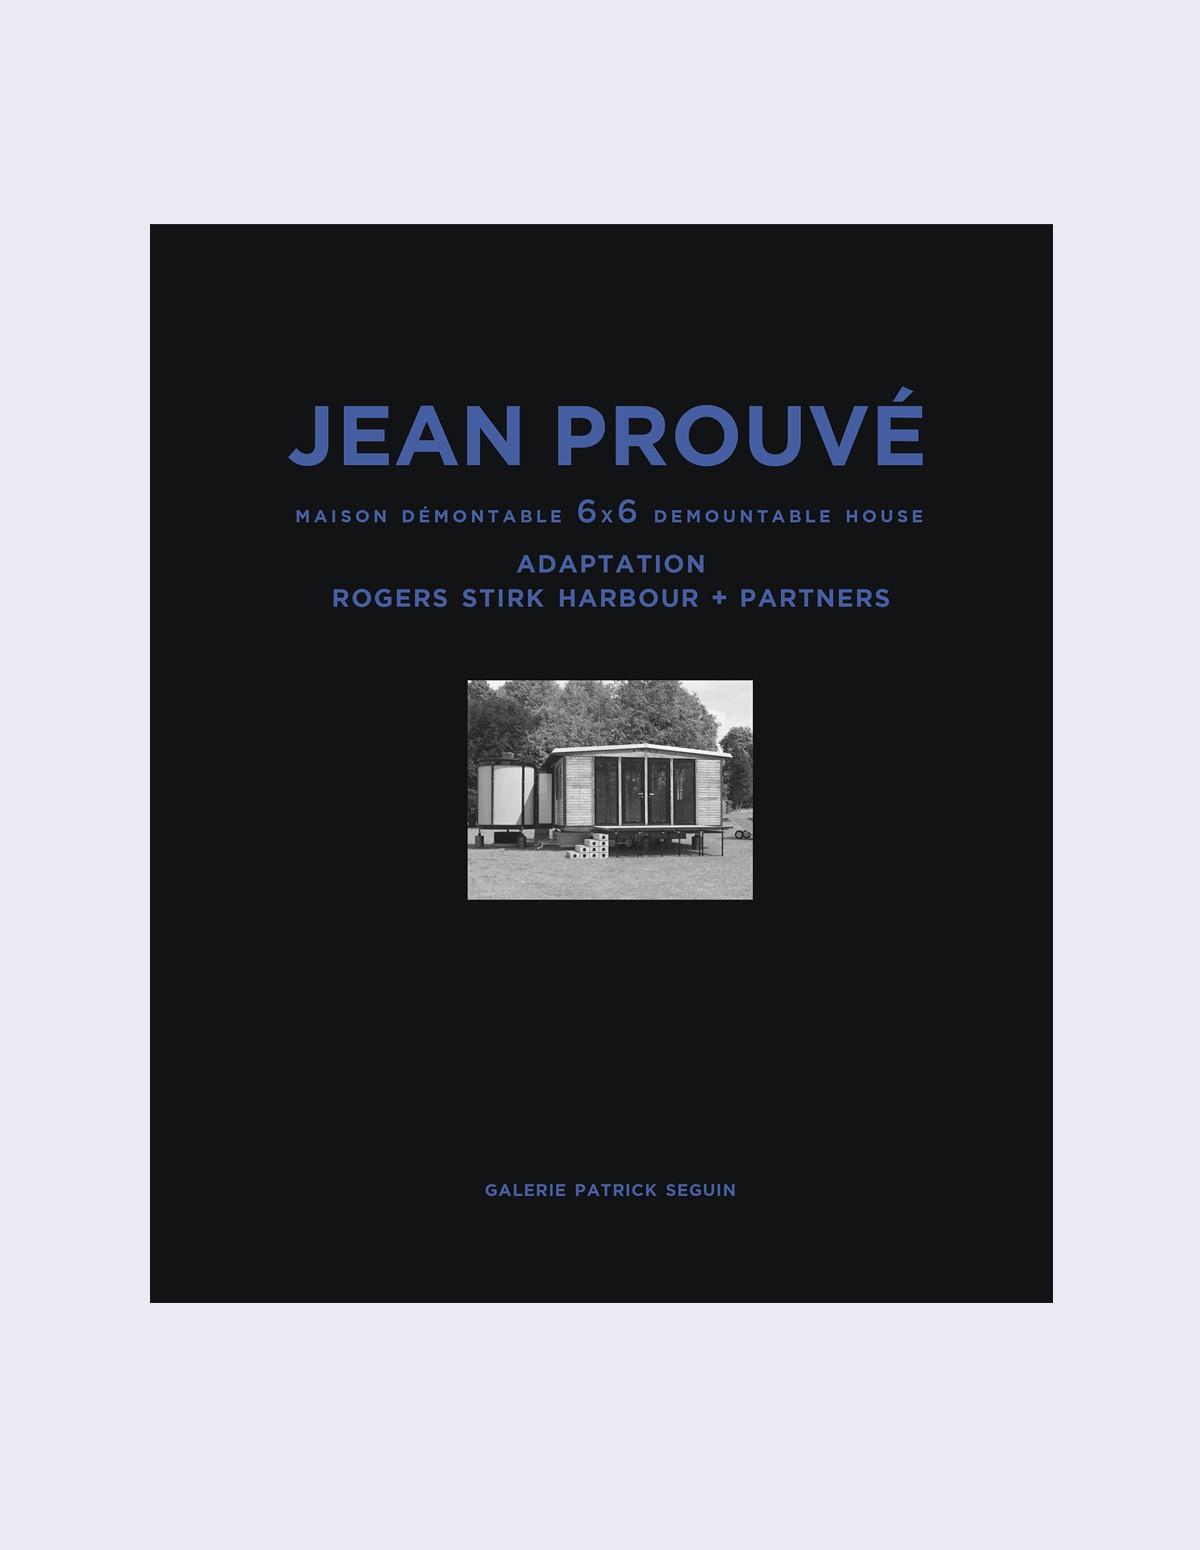 J. PROUVE ADAPTATION R. STIRK